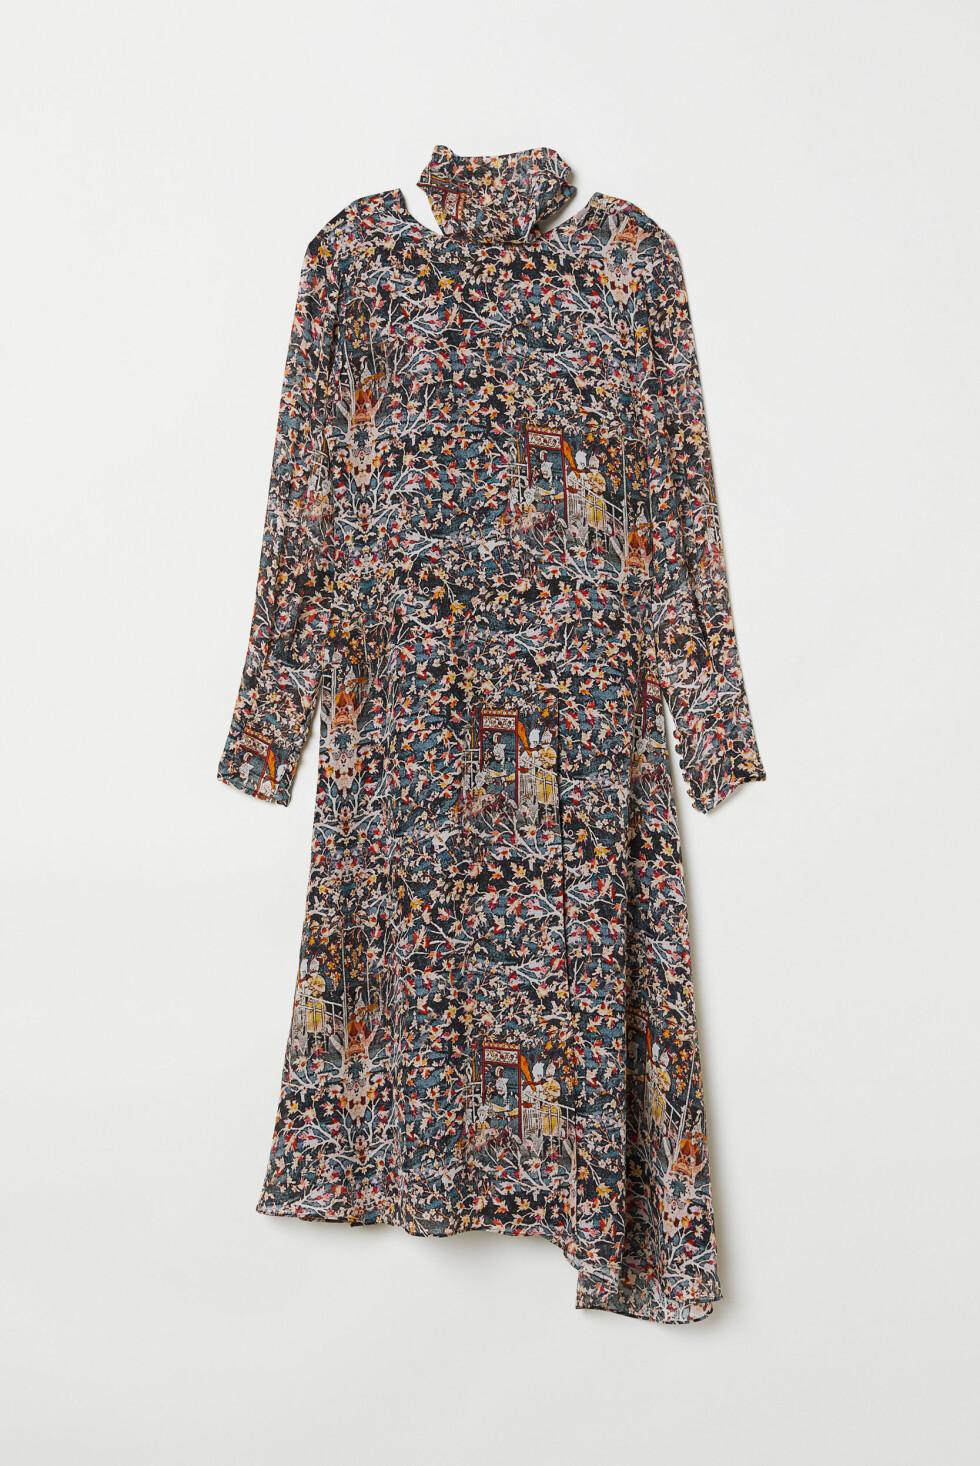 Kjole fra H&M |1300,-| https://www2.hm.com/no_no/productpage.0682576001.html